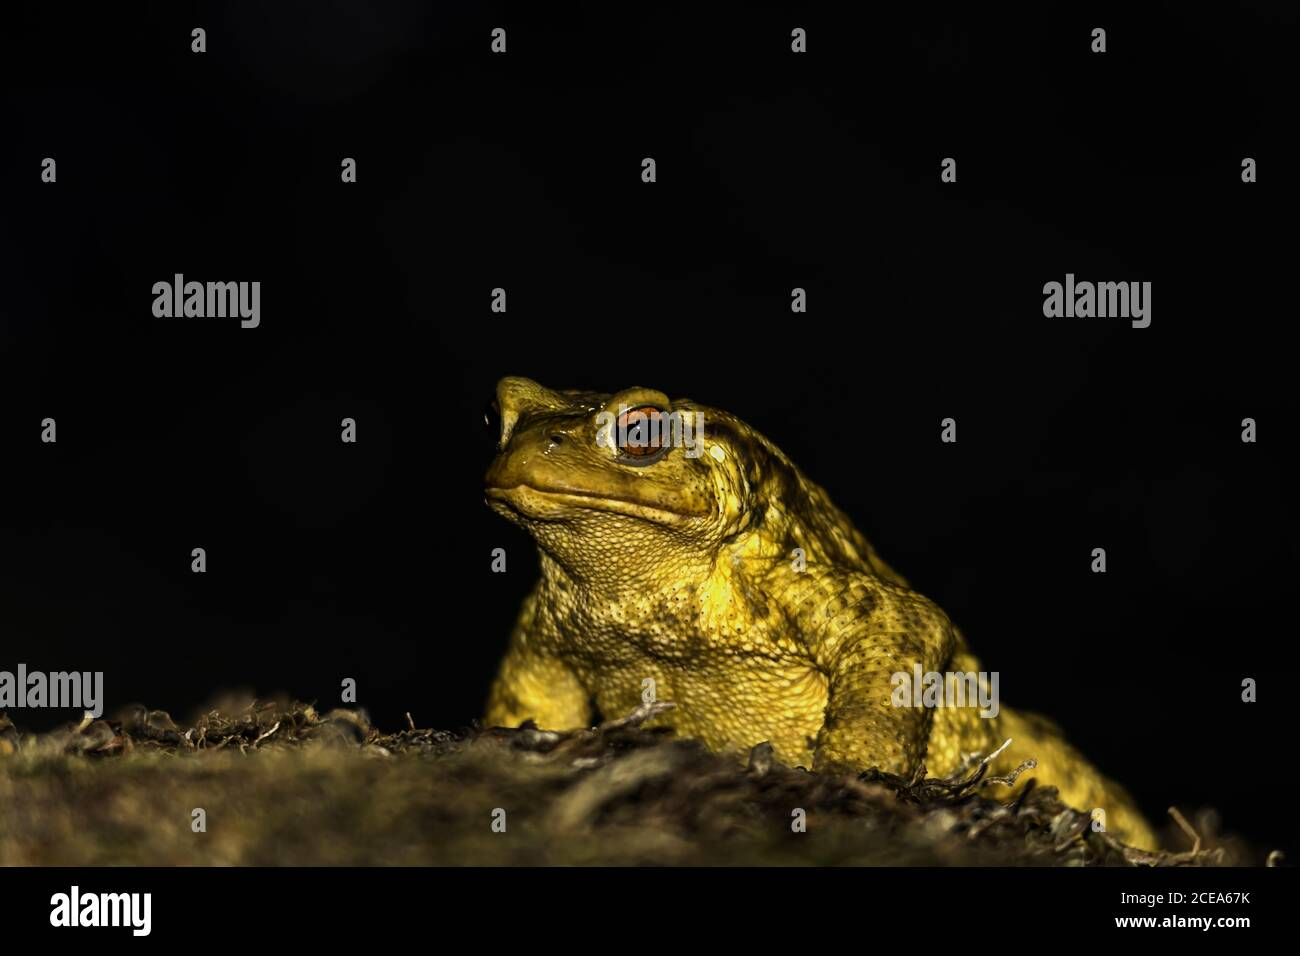 Primer plano de sapo amarillo con ojo rojo abultado aislado sobre un fondo oscuro Foto de stock